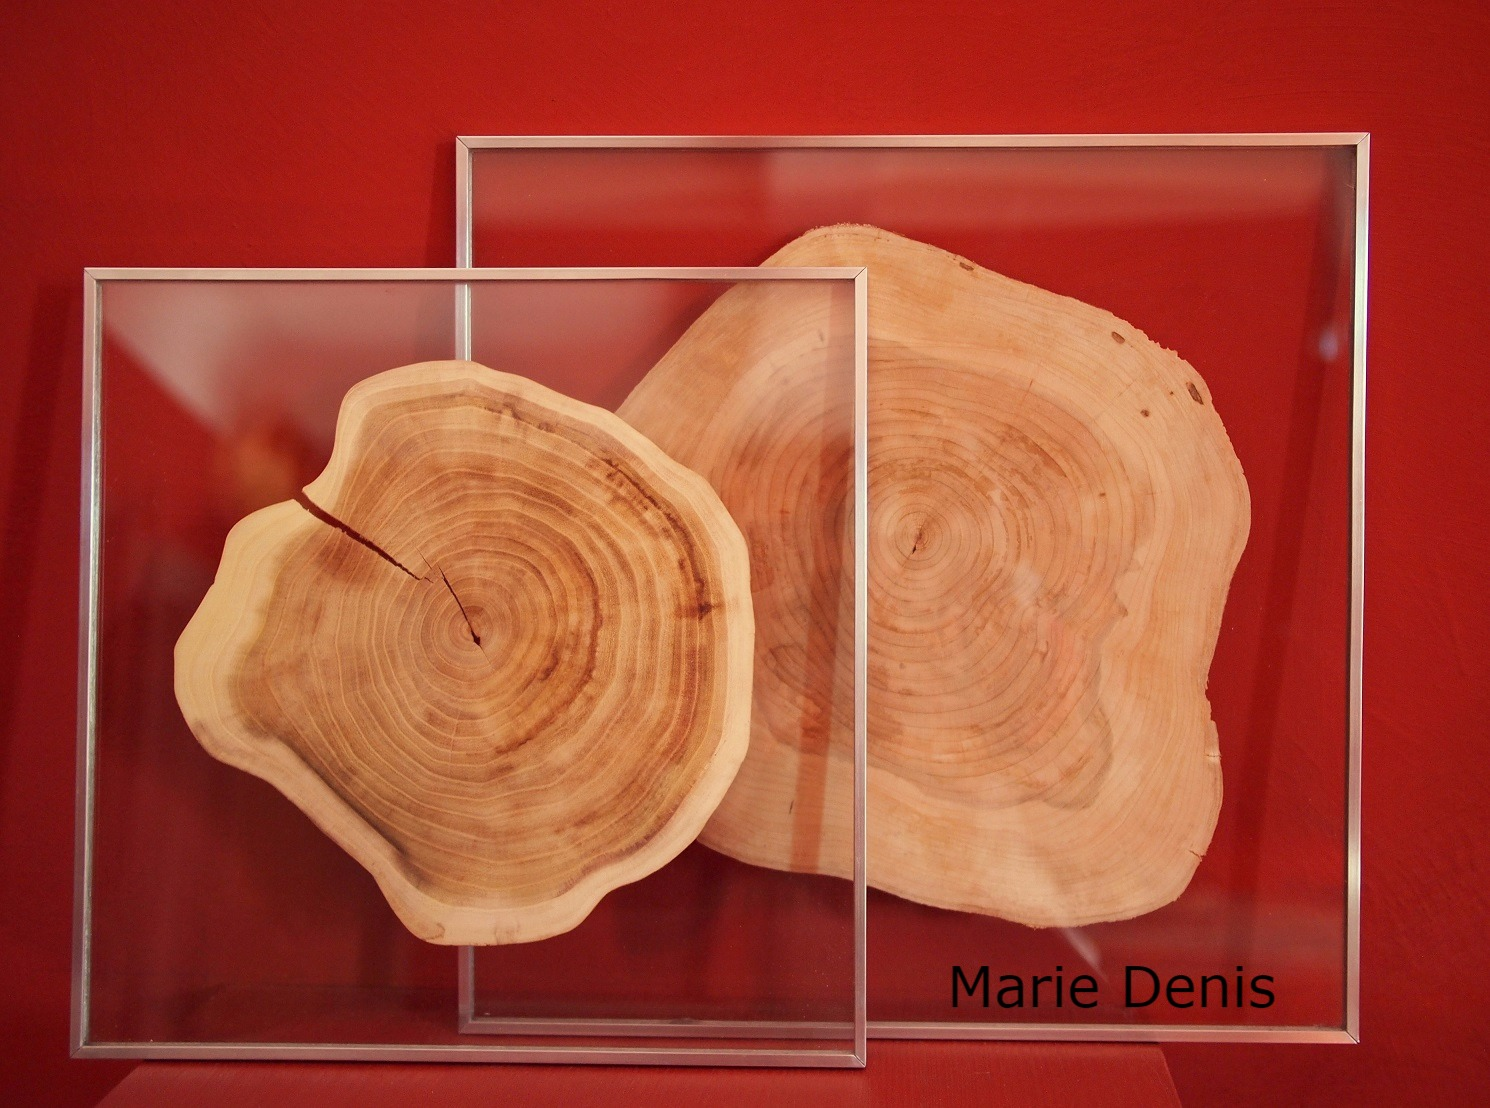 Marie Denis